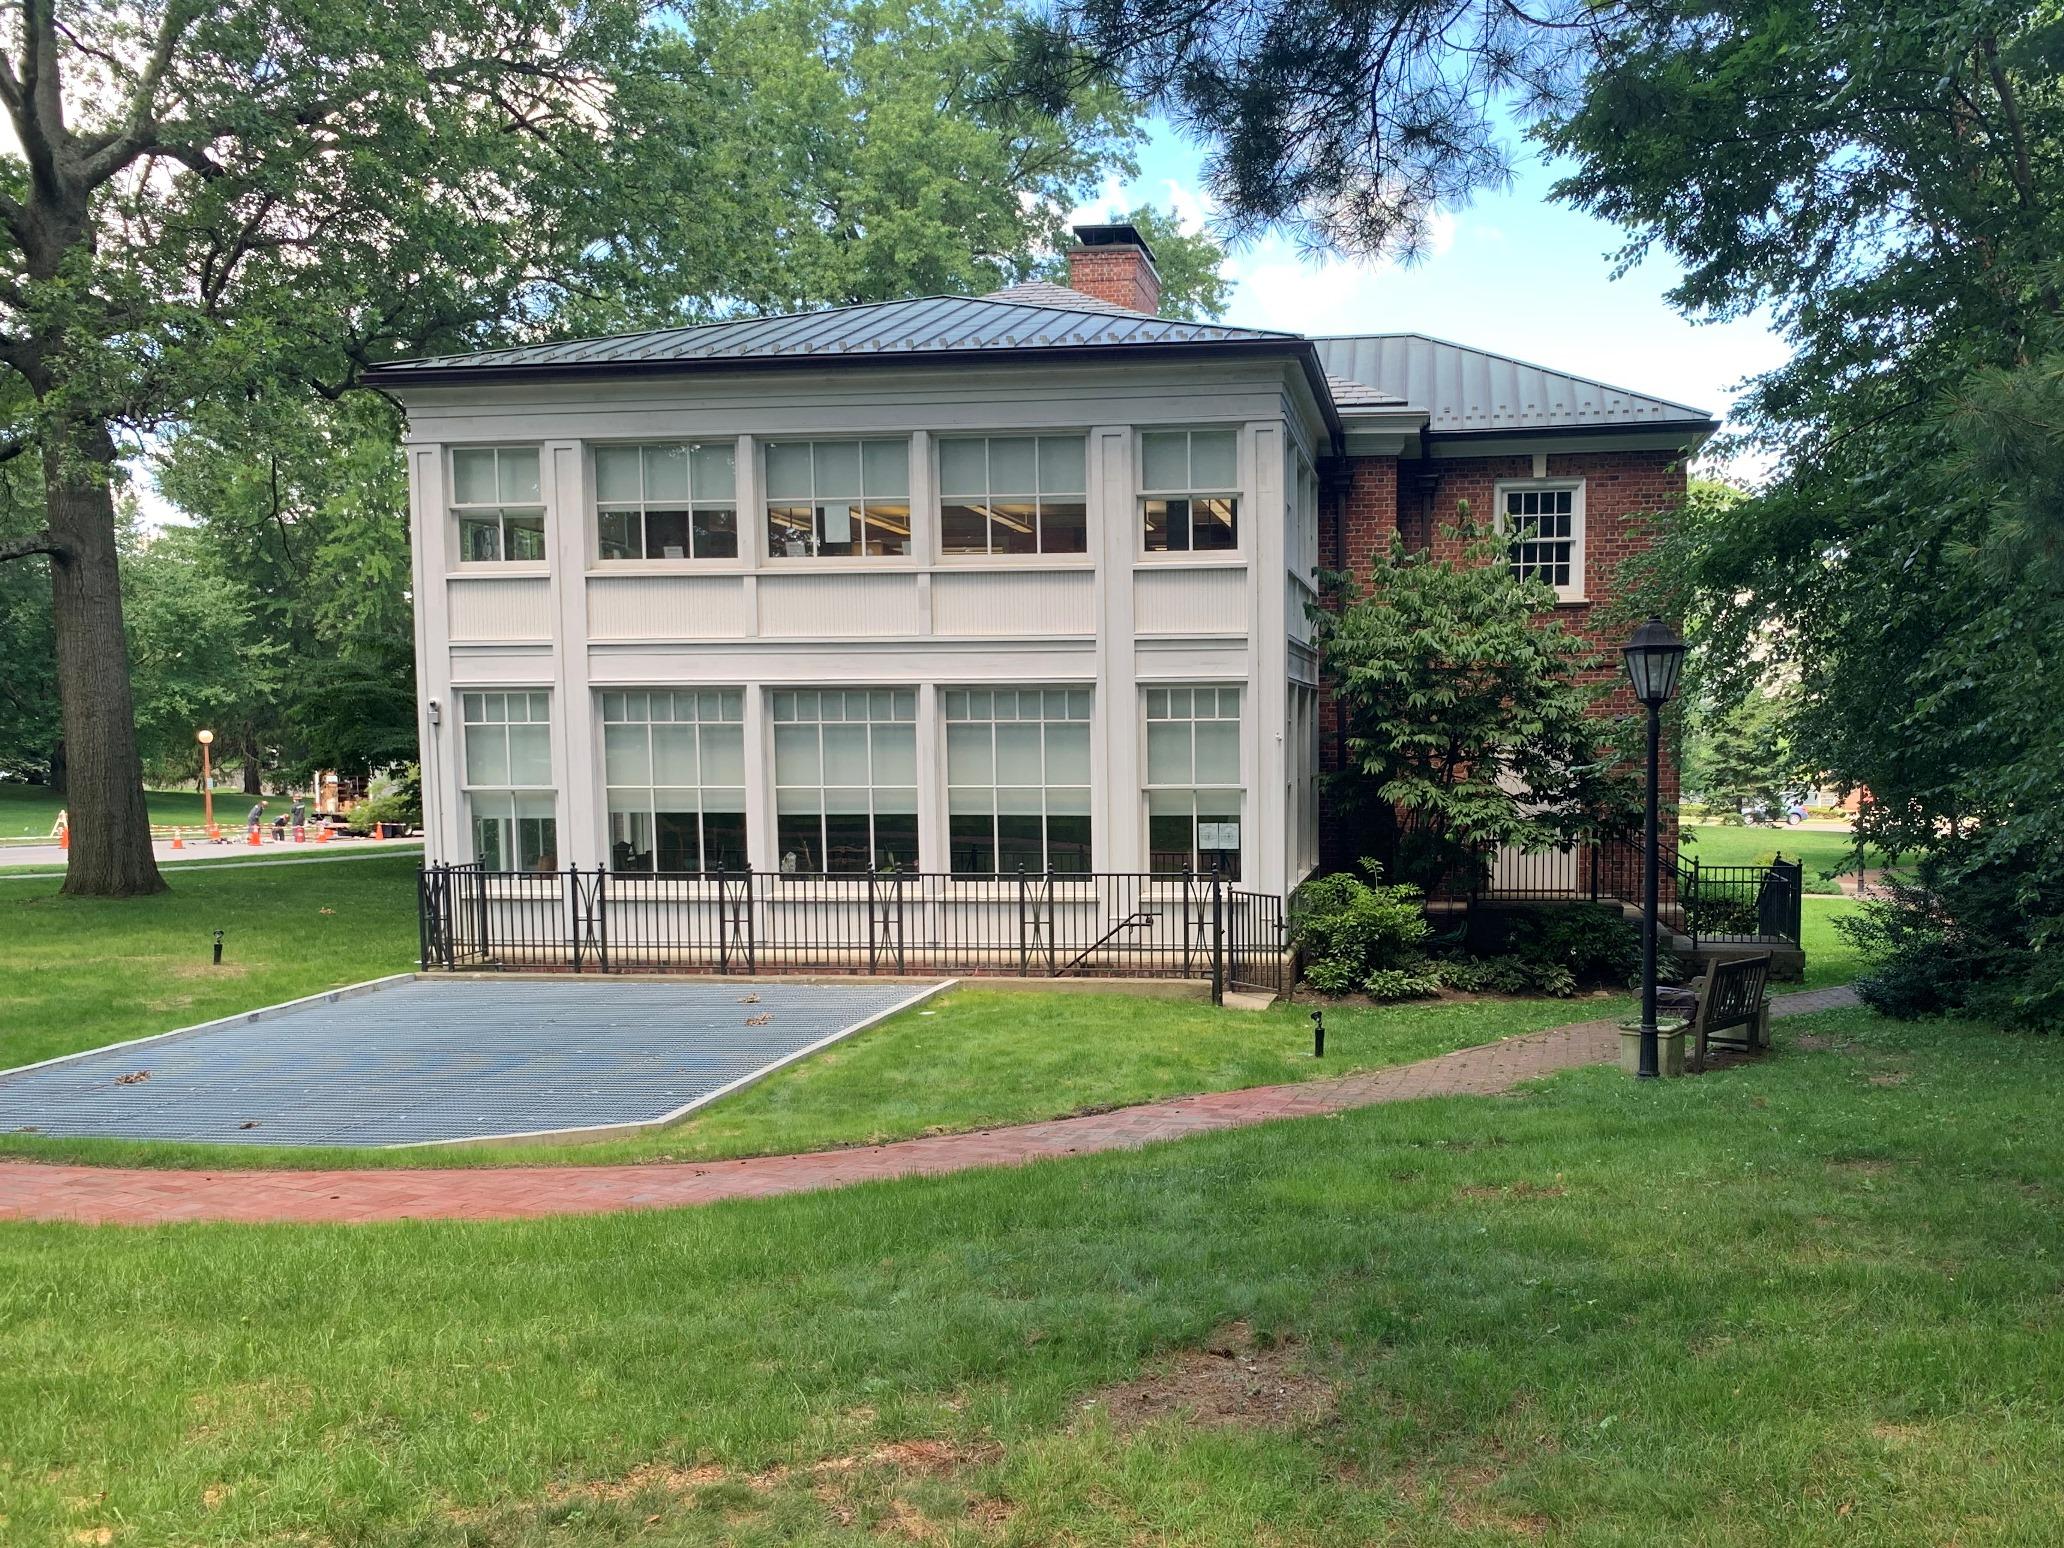 Bronxville Public Library